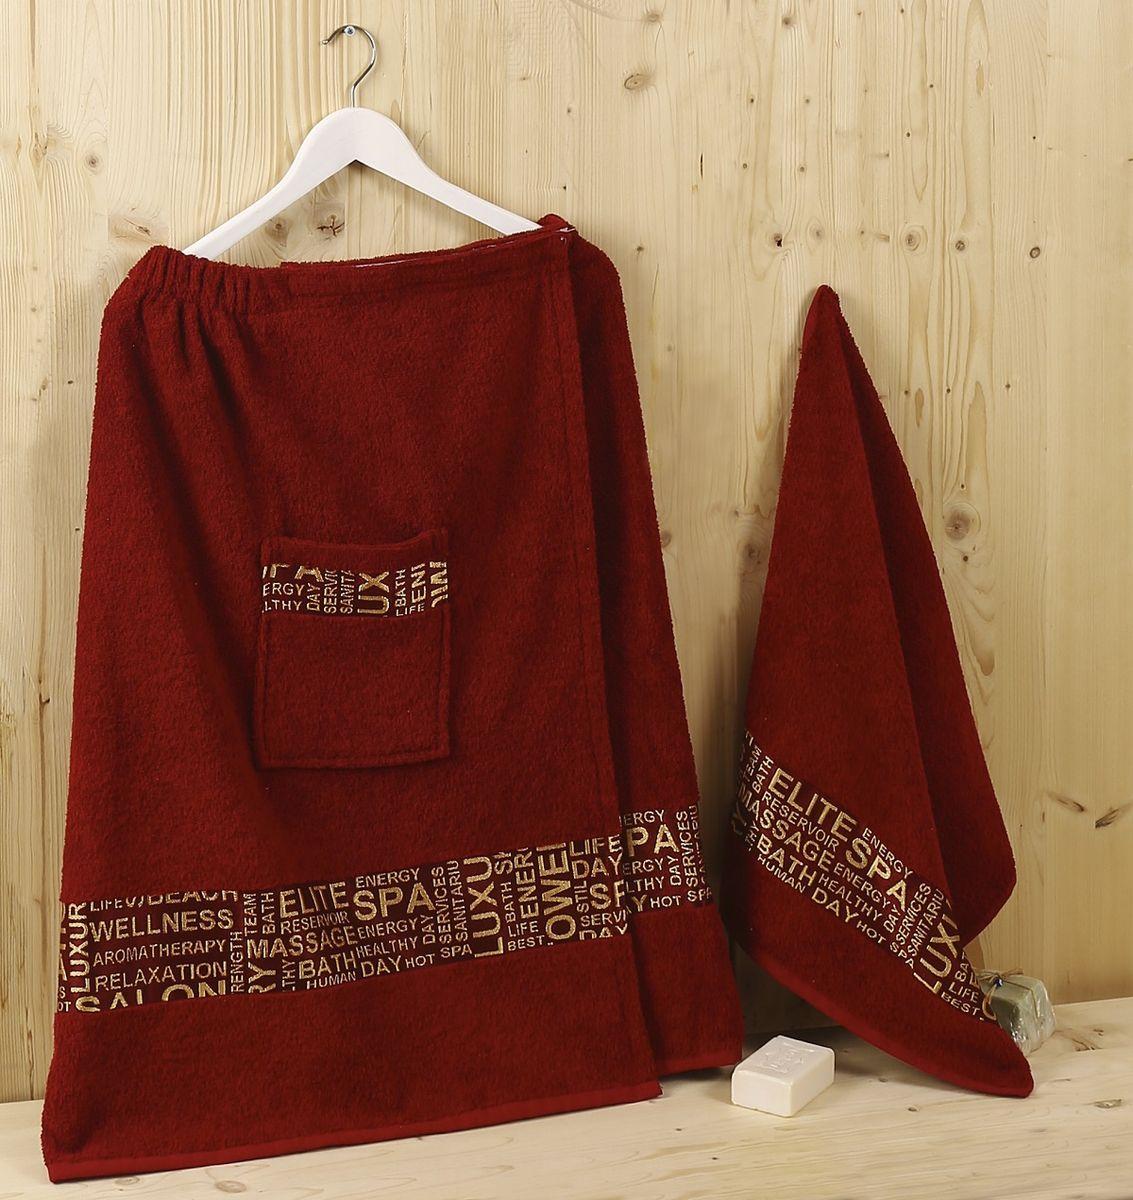 Набор для сауны Karna Relax, цвет: бордовый, 2 предмета1239/CHAR001